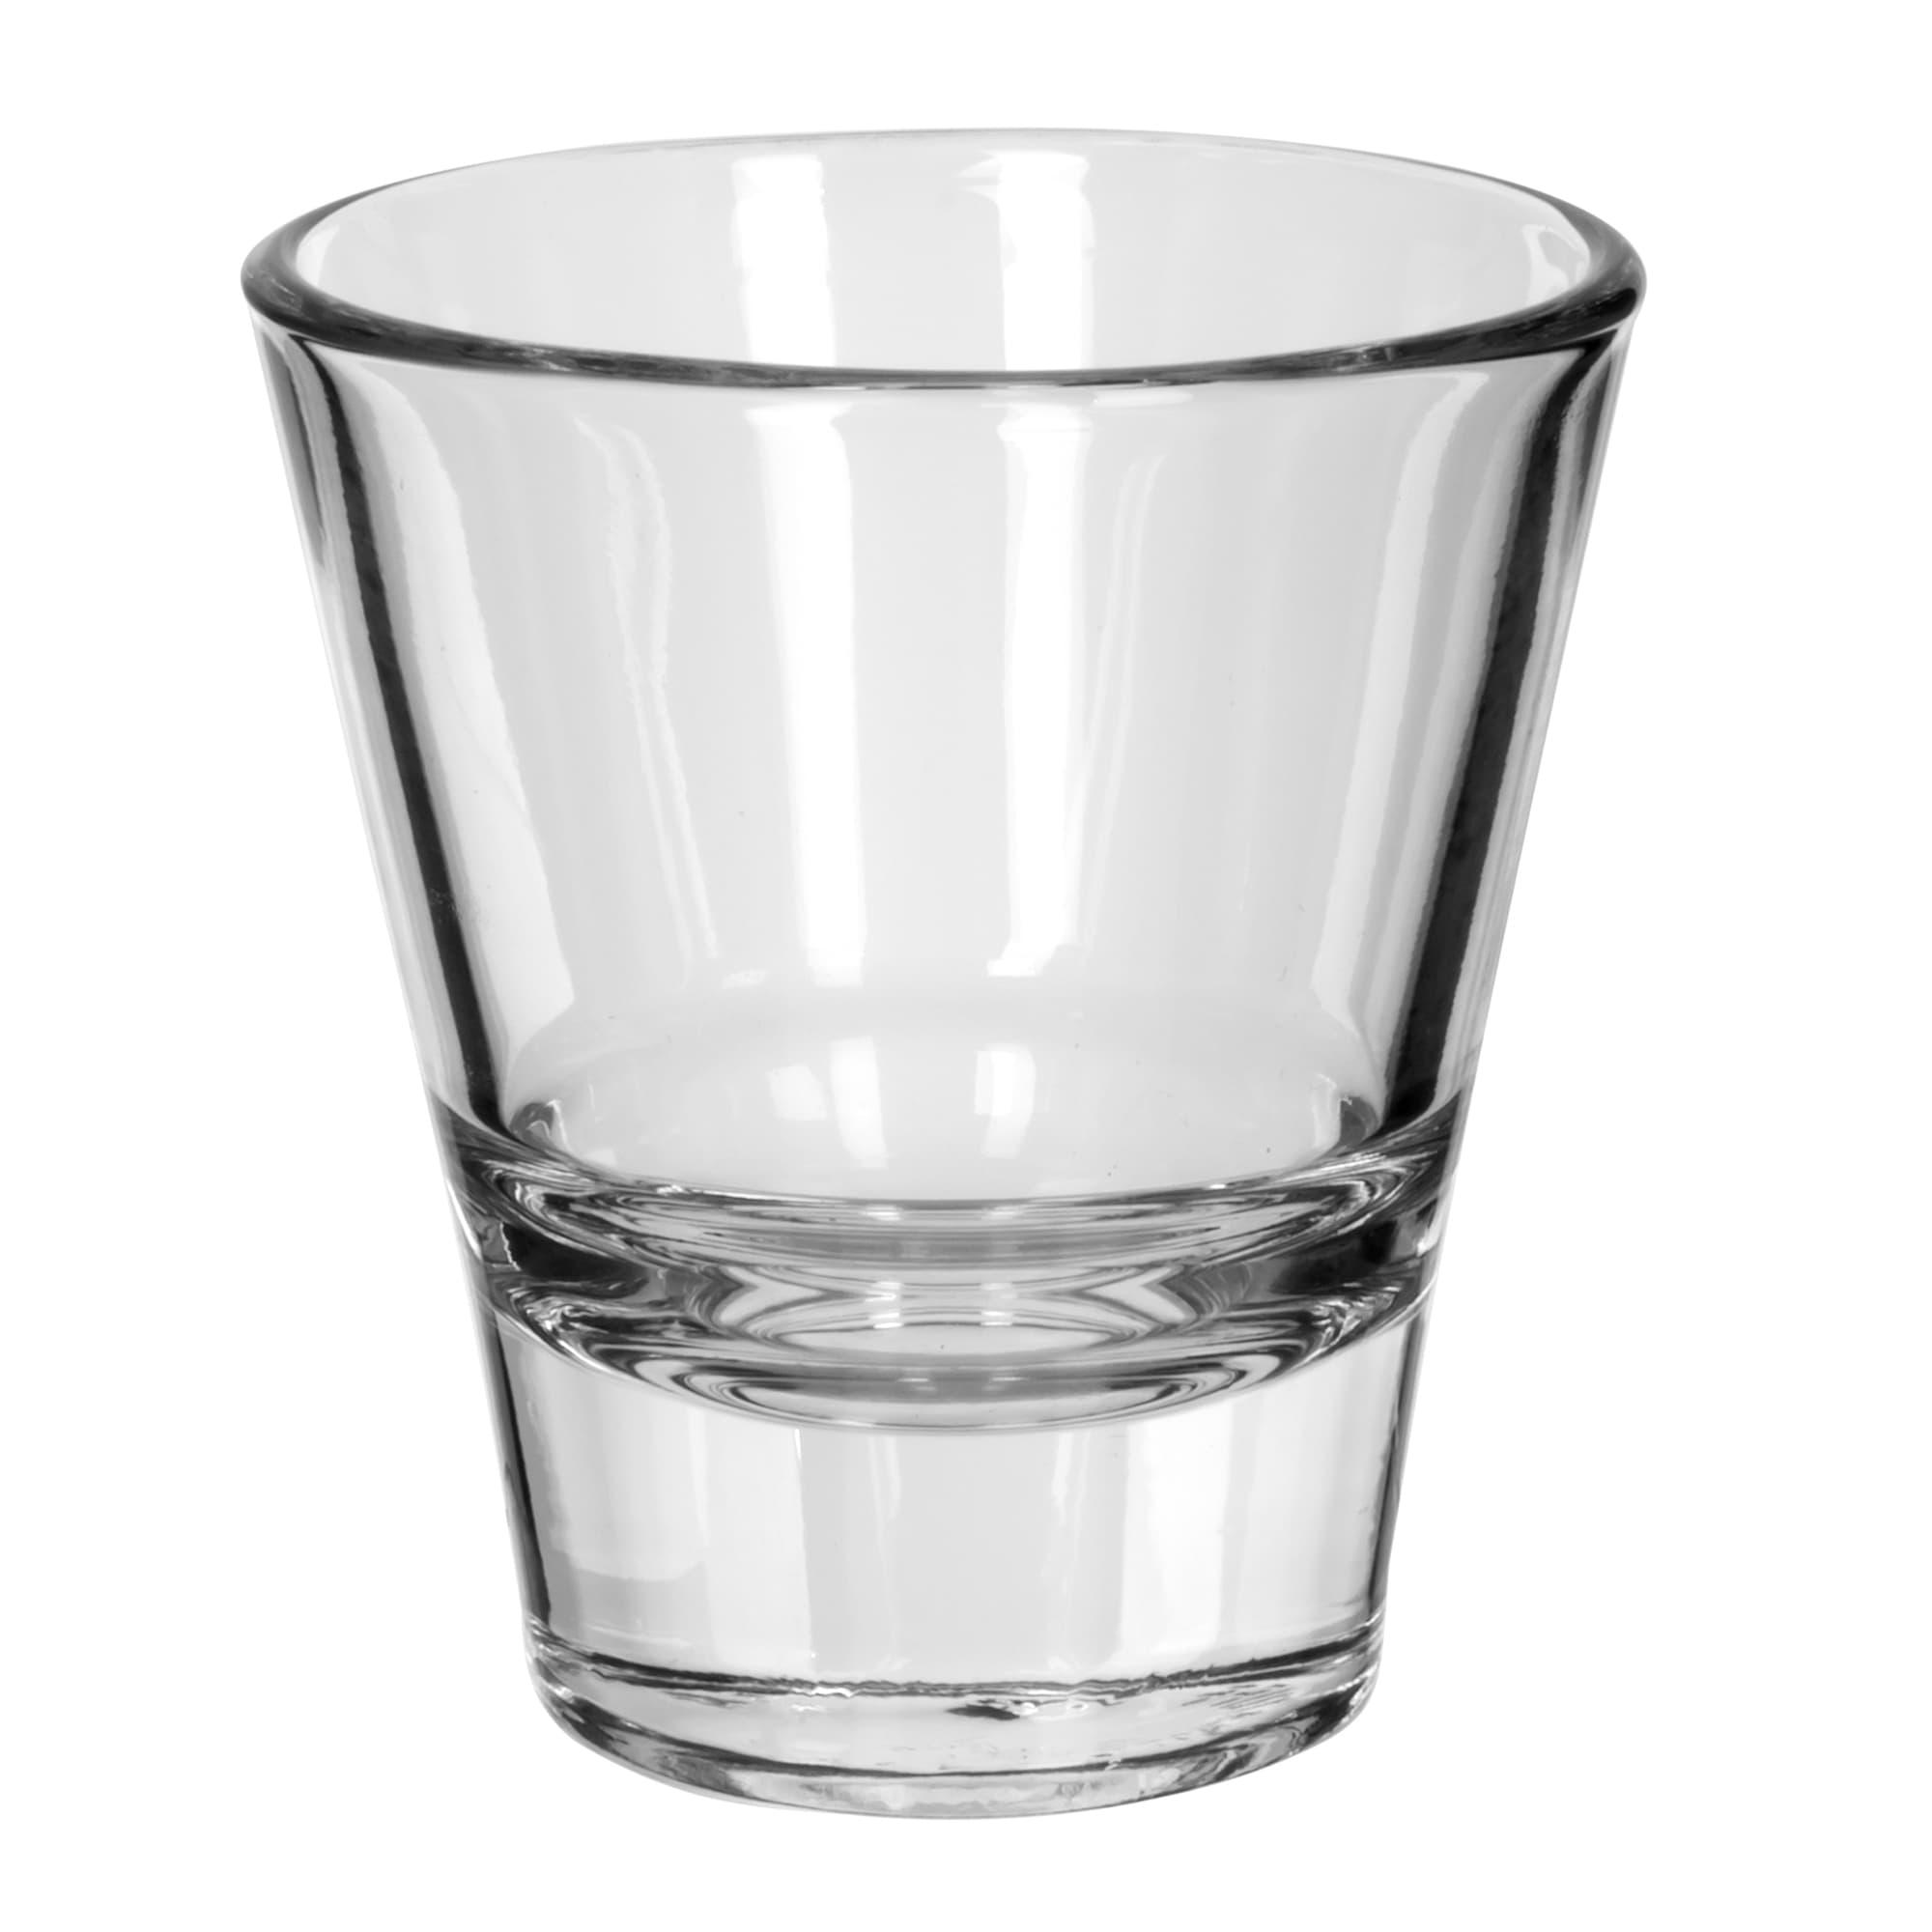 Libbey 15733 3.7 oz DuraTuff Endeavor Espresso Glass